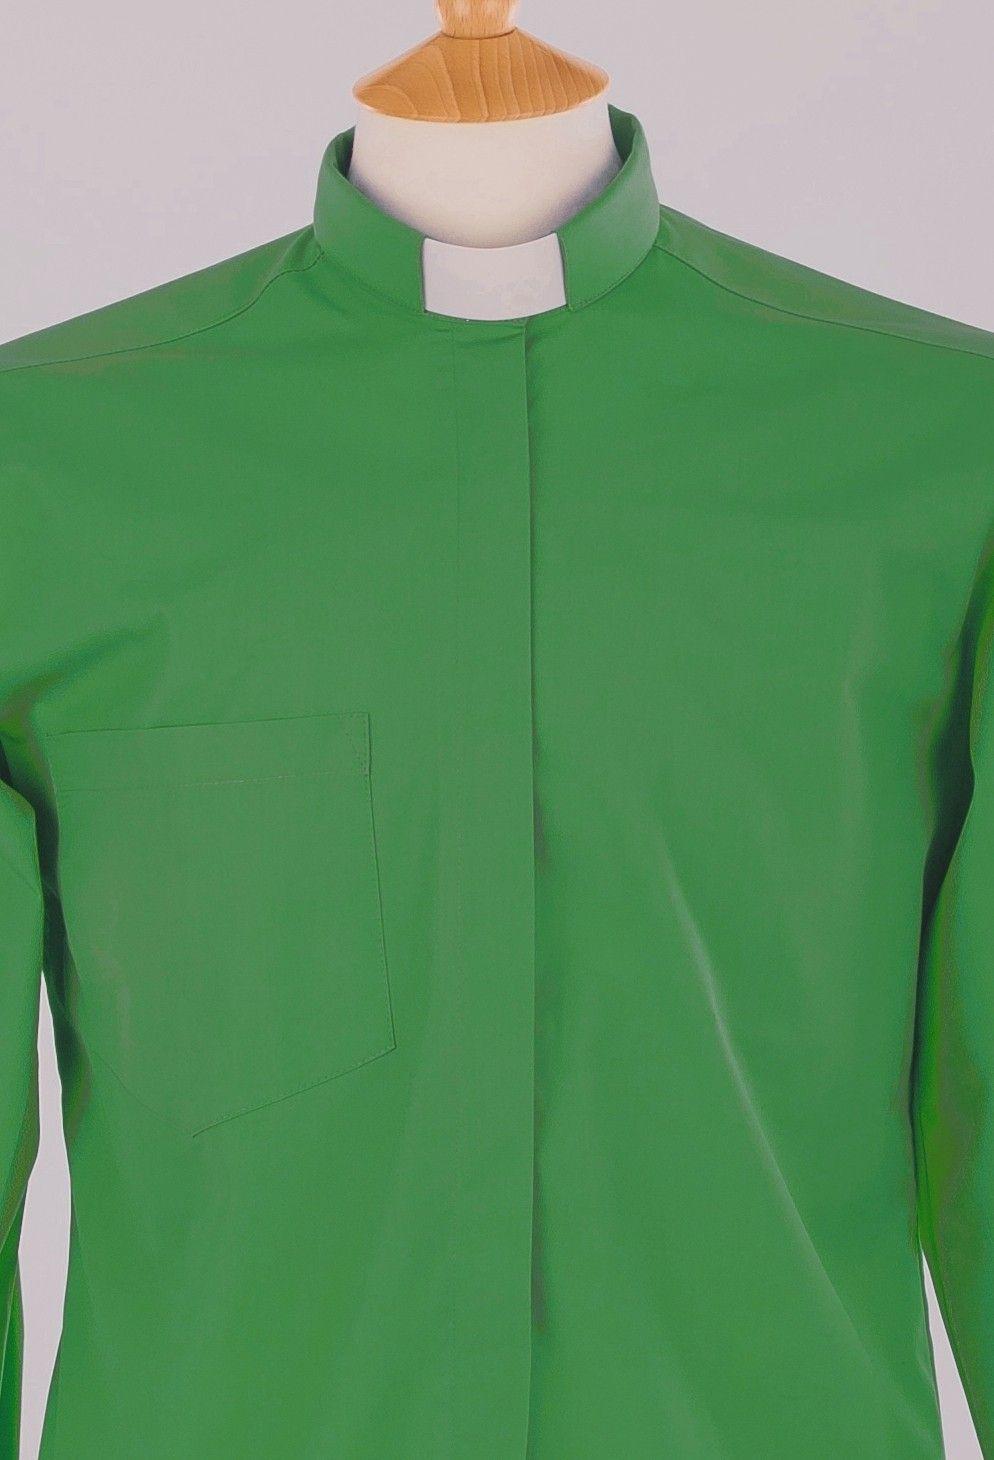 Emerald Green Tunnel Collar Clergy Shirt Carrowmenagh Endofthehols